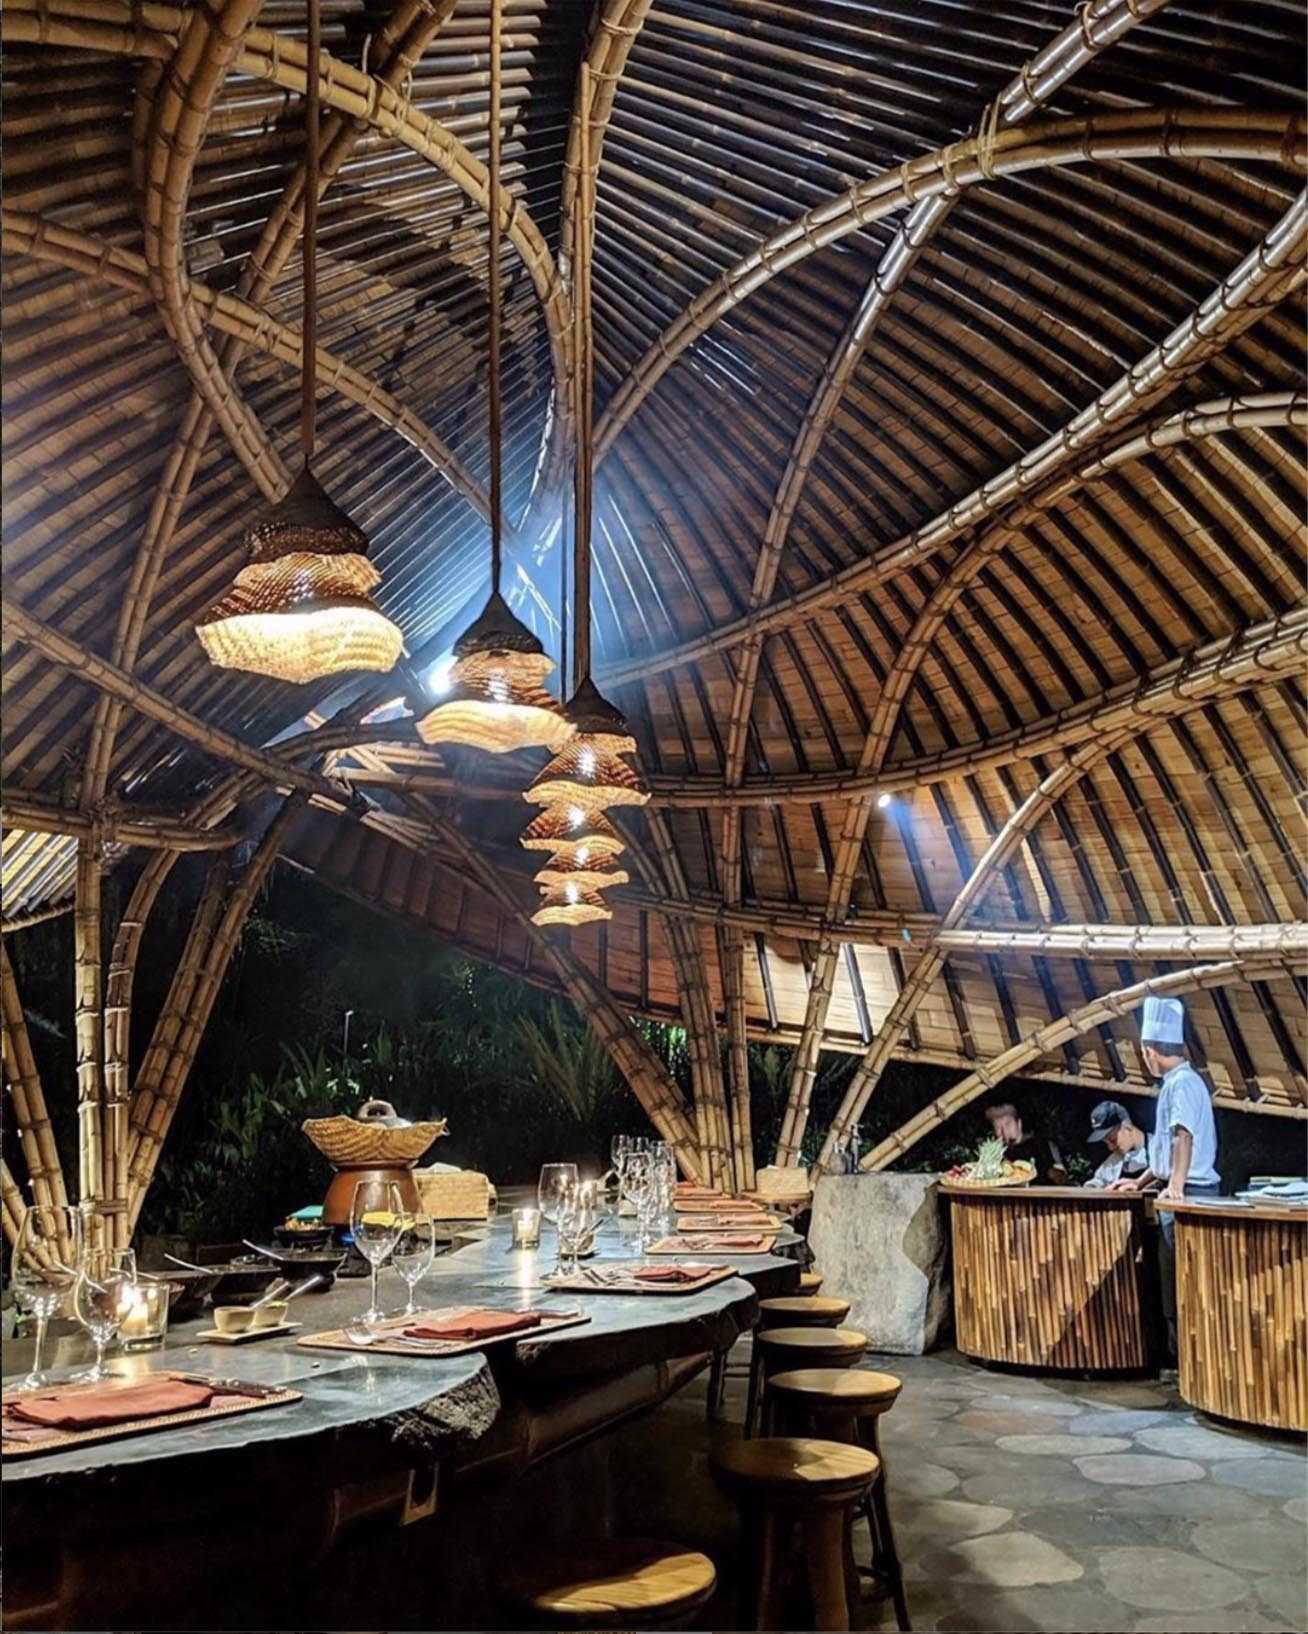 Agung Budi Raharsa | Architecture & Engineering Sokasi Bamboo Cooking Class / School - Bali Bali, Indonesia Bali, Indonesia Agung-Budi-Raharsa-Sokasi-Cooking-Class-School-Bali   88762